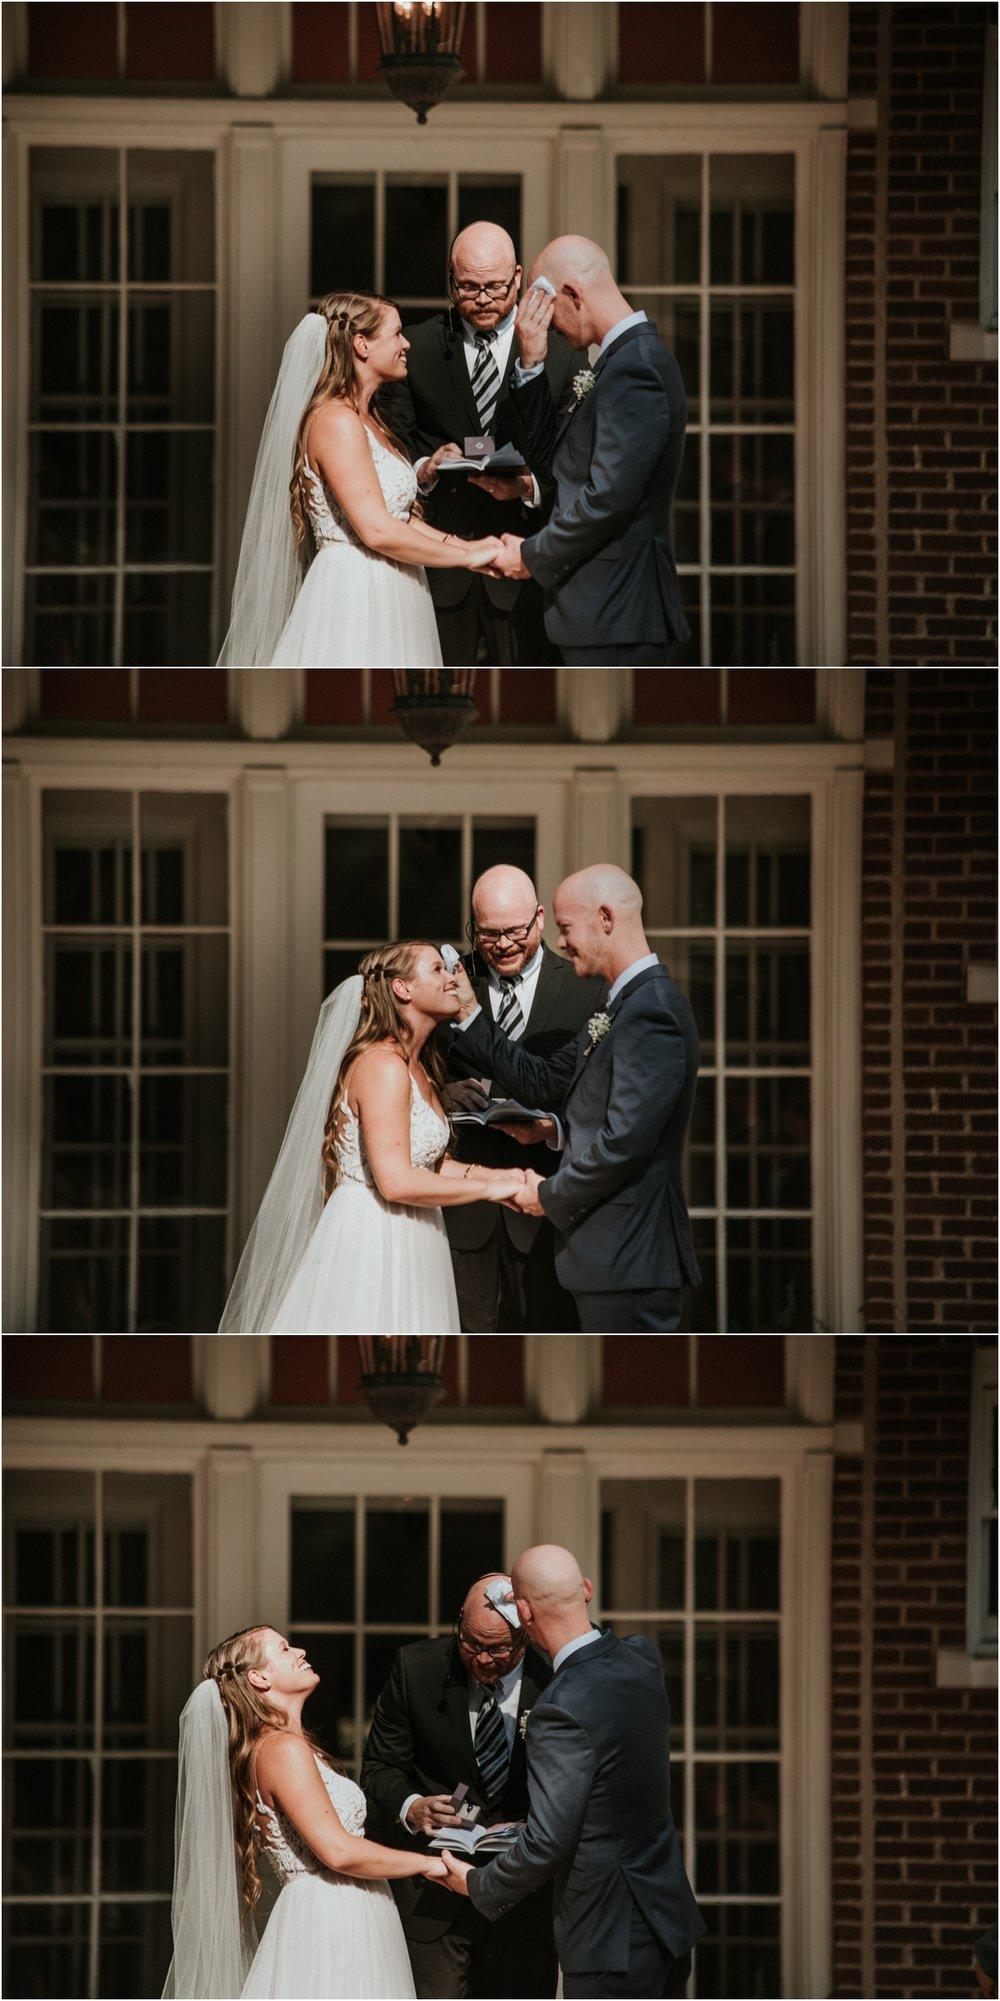 Stowe-manor-wedding-belmont-nc_0033.jpg